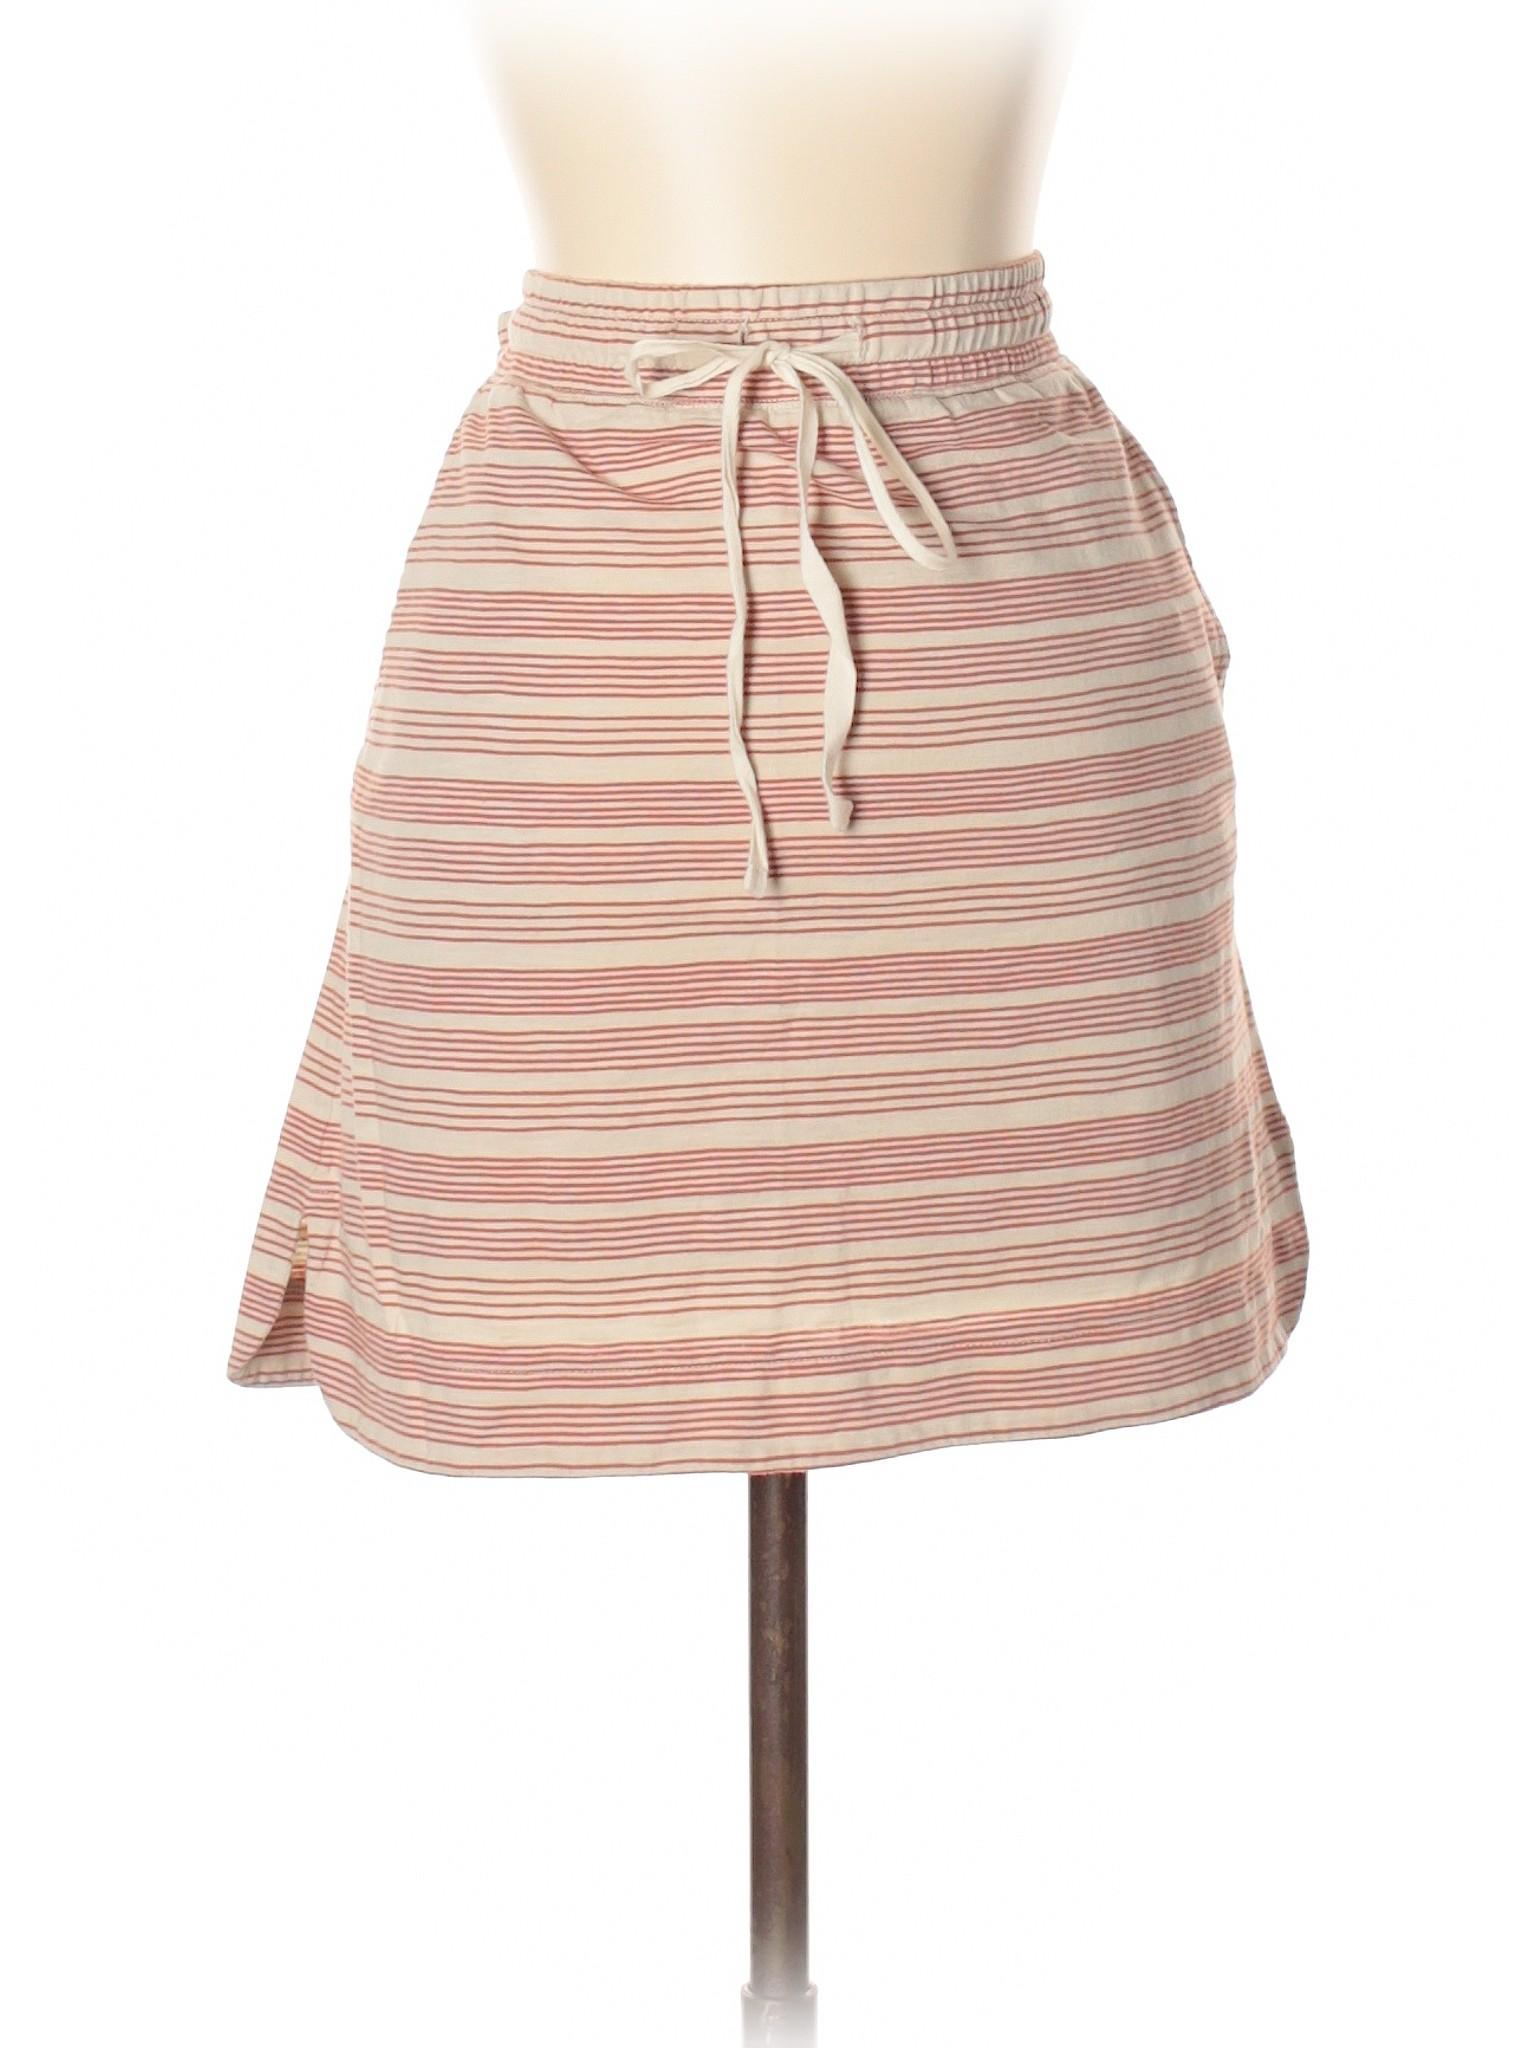 Casual Skirt Leisure Ann Taylor winter LOFT wqxnFUvfgH